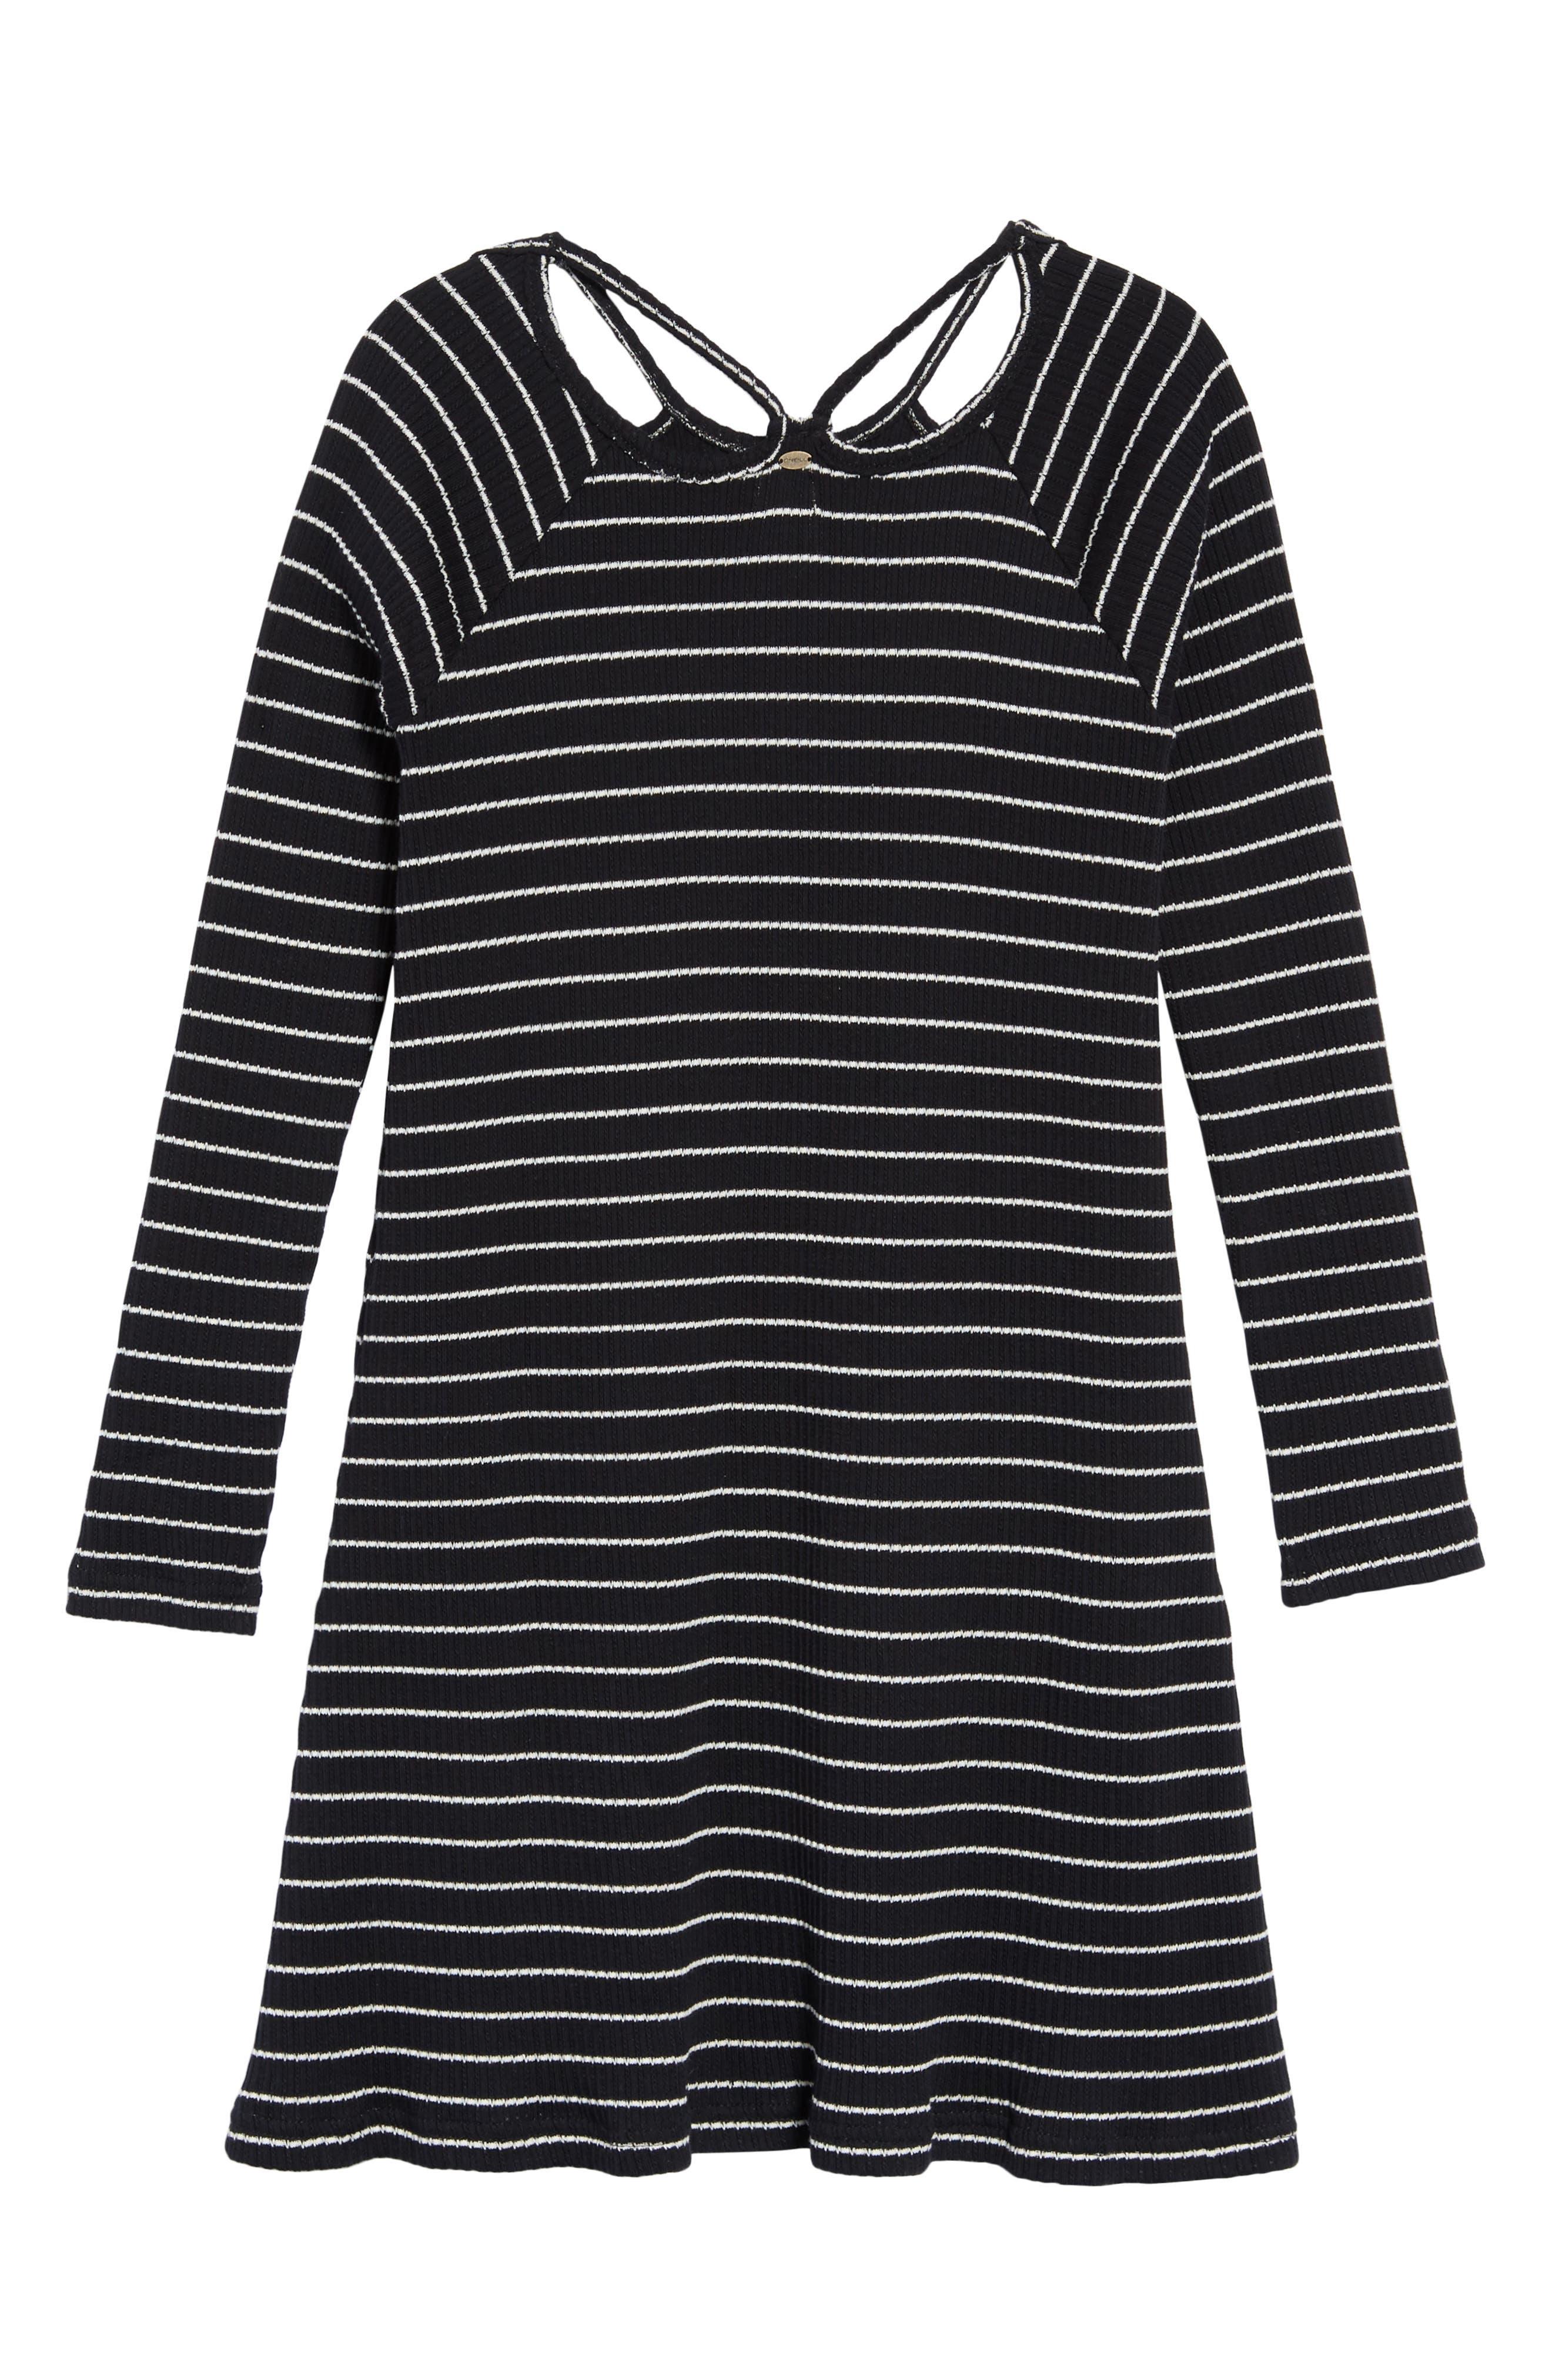 Millie Stripe Knit Dress,                             Alternate thumbnail 2, color,                             BLACK